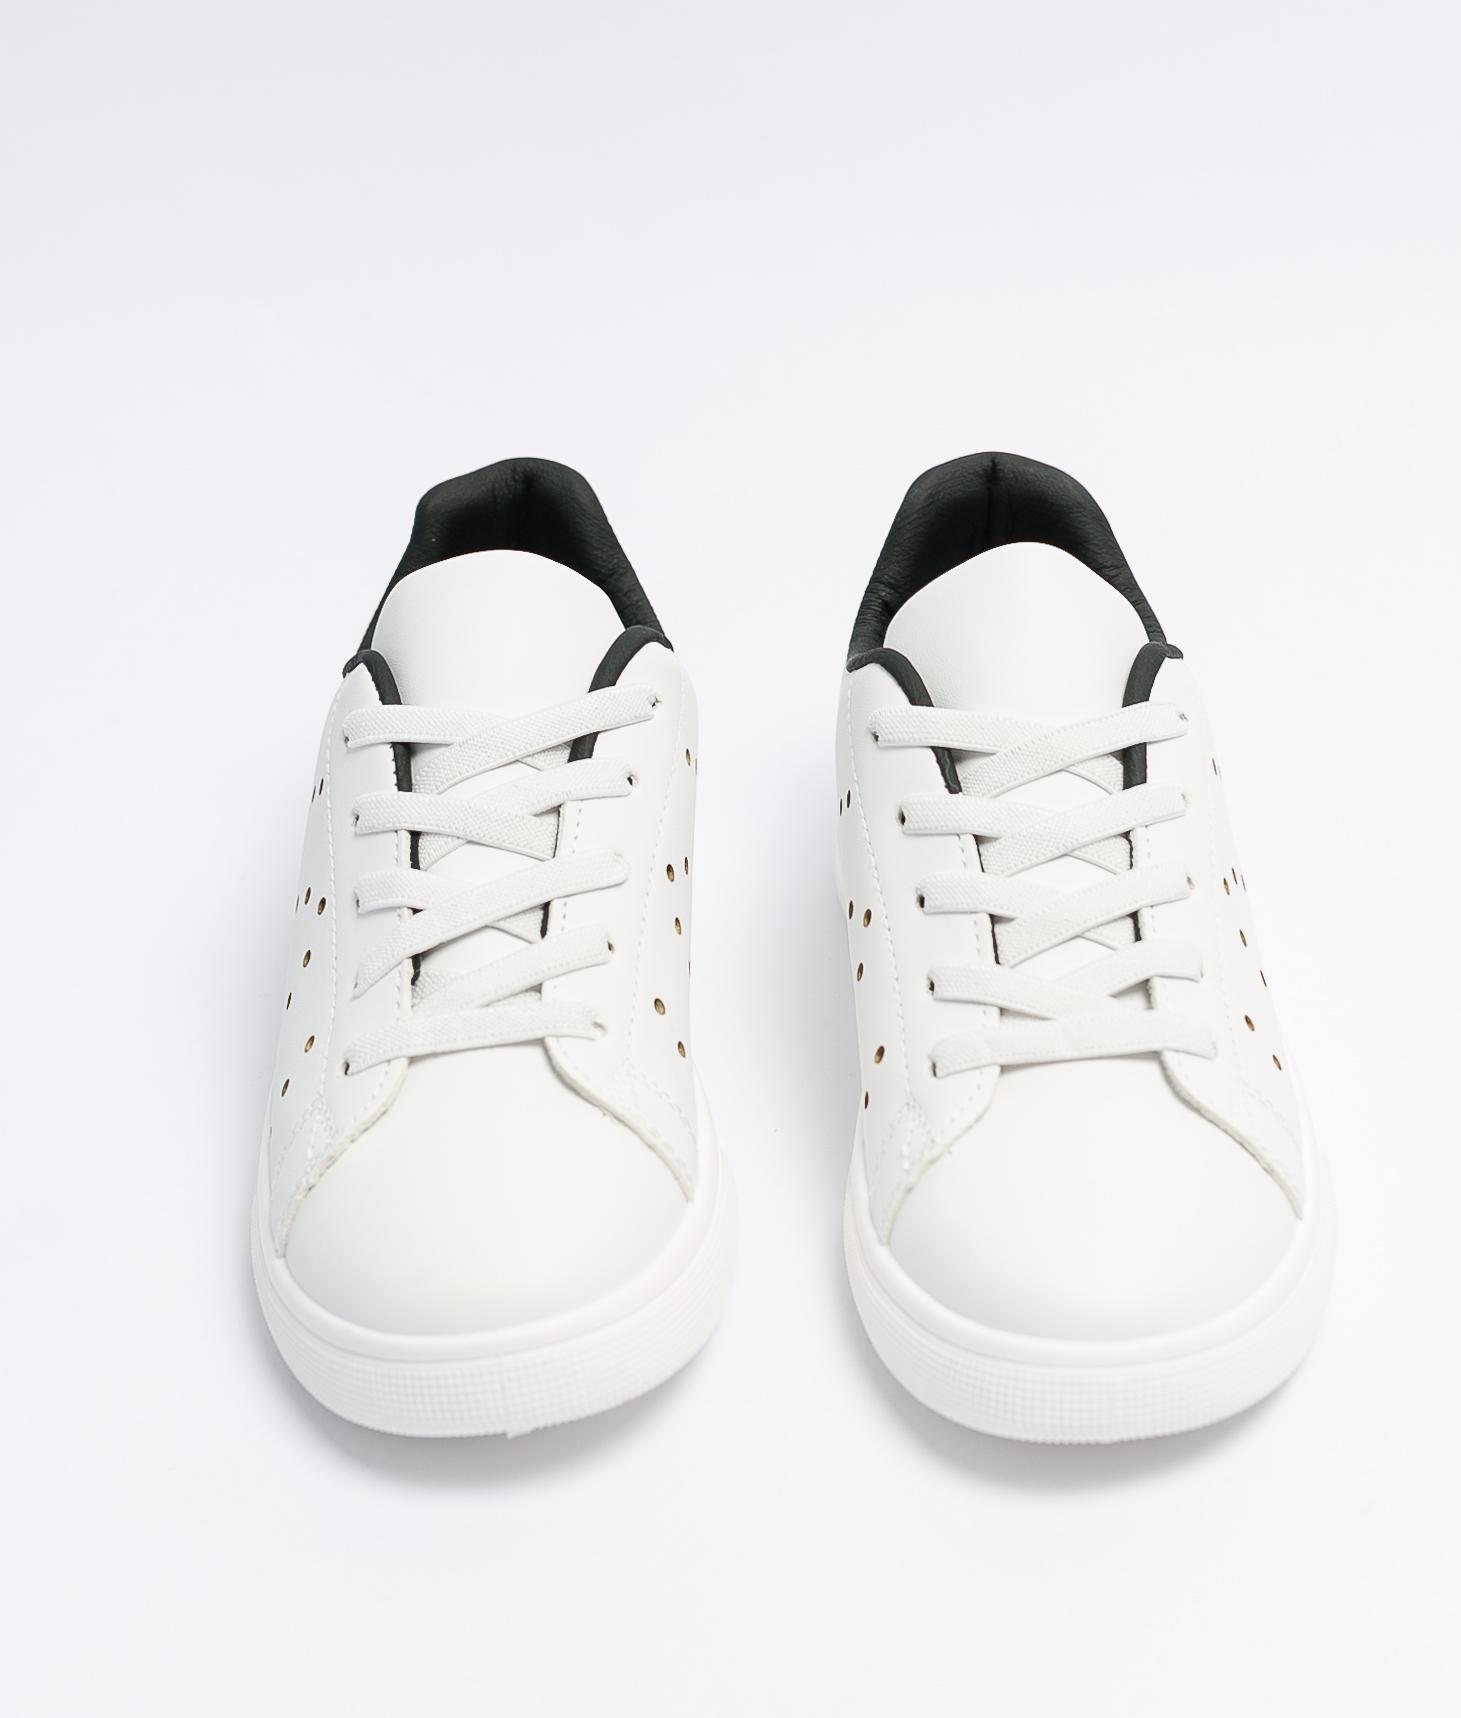 Sneakers Atelier - Preto